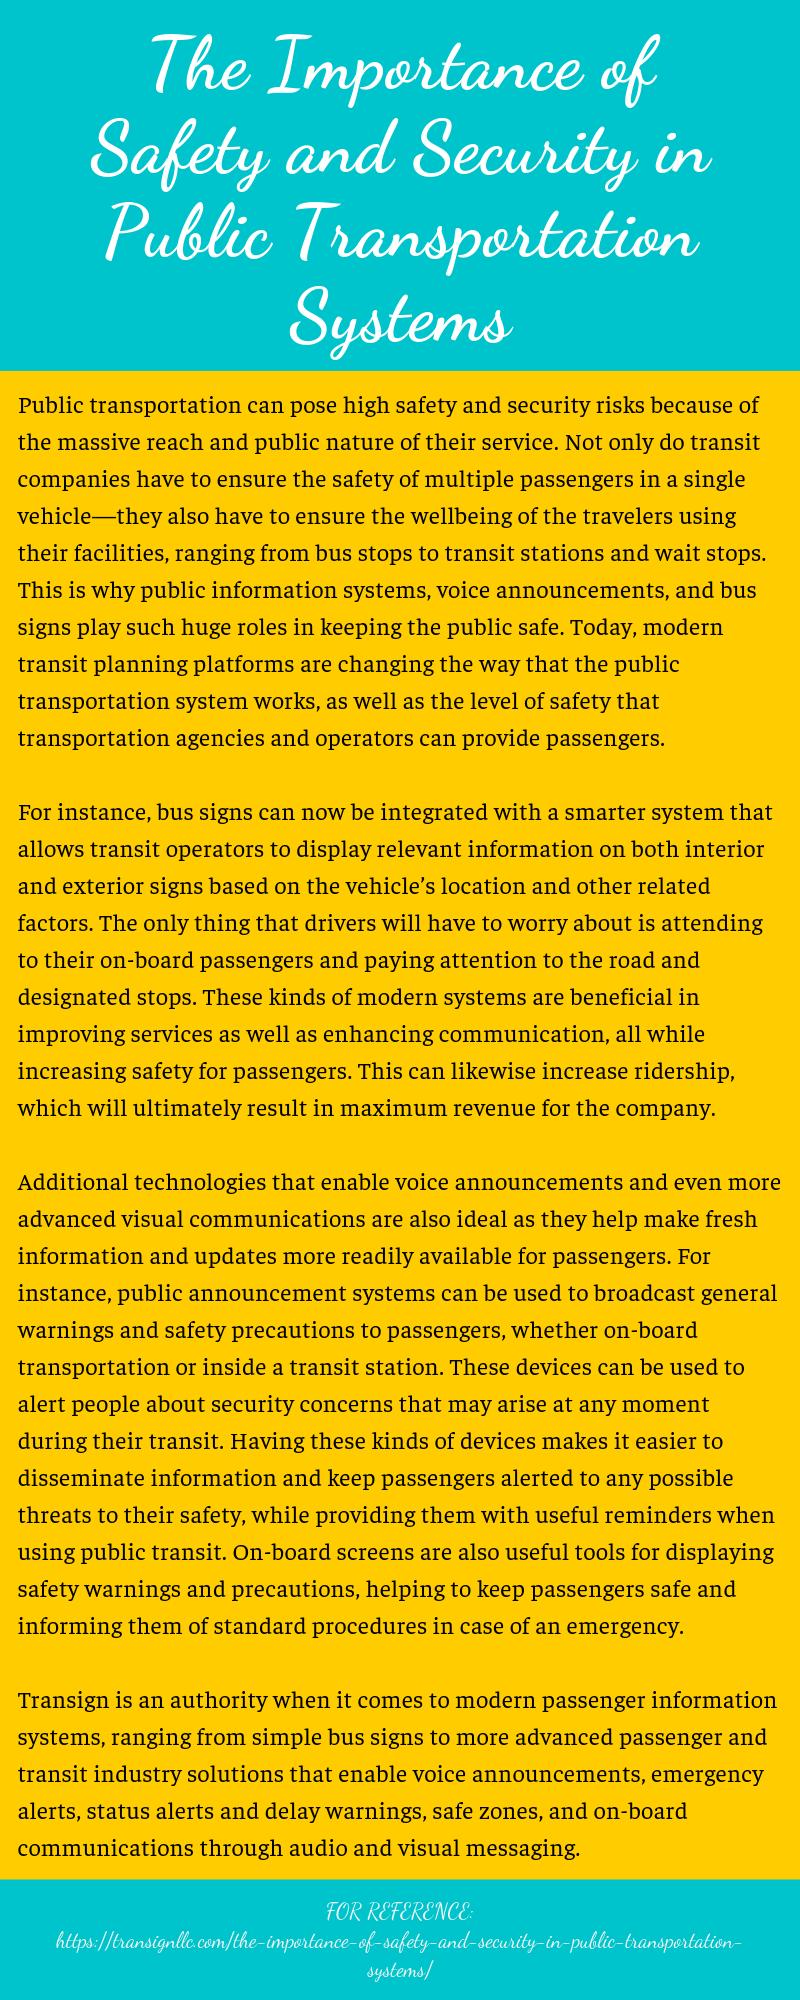 Role of Voice Announcements in Public Transportation